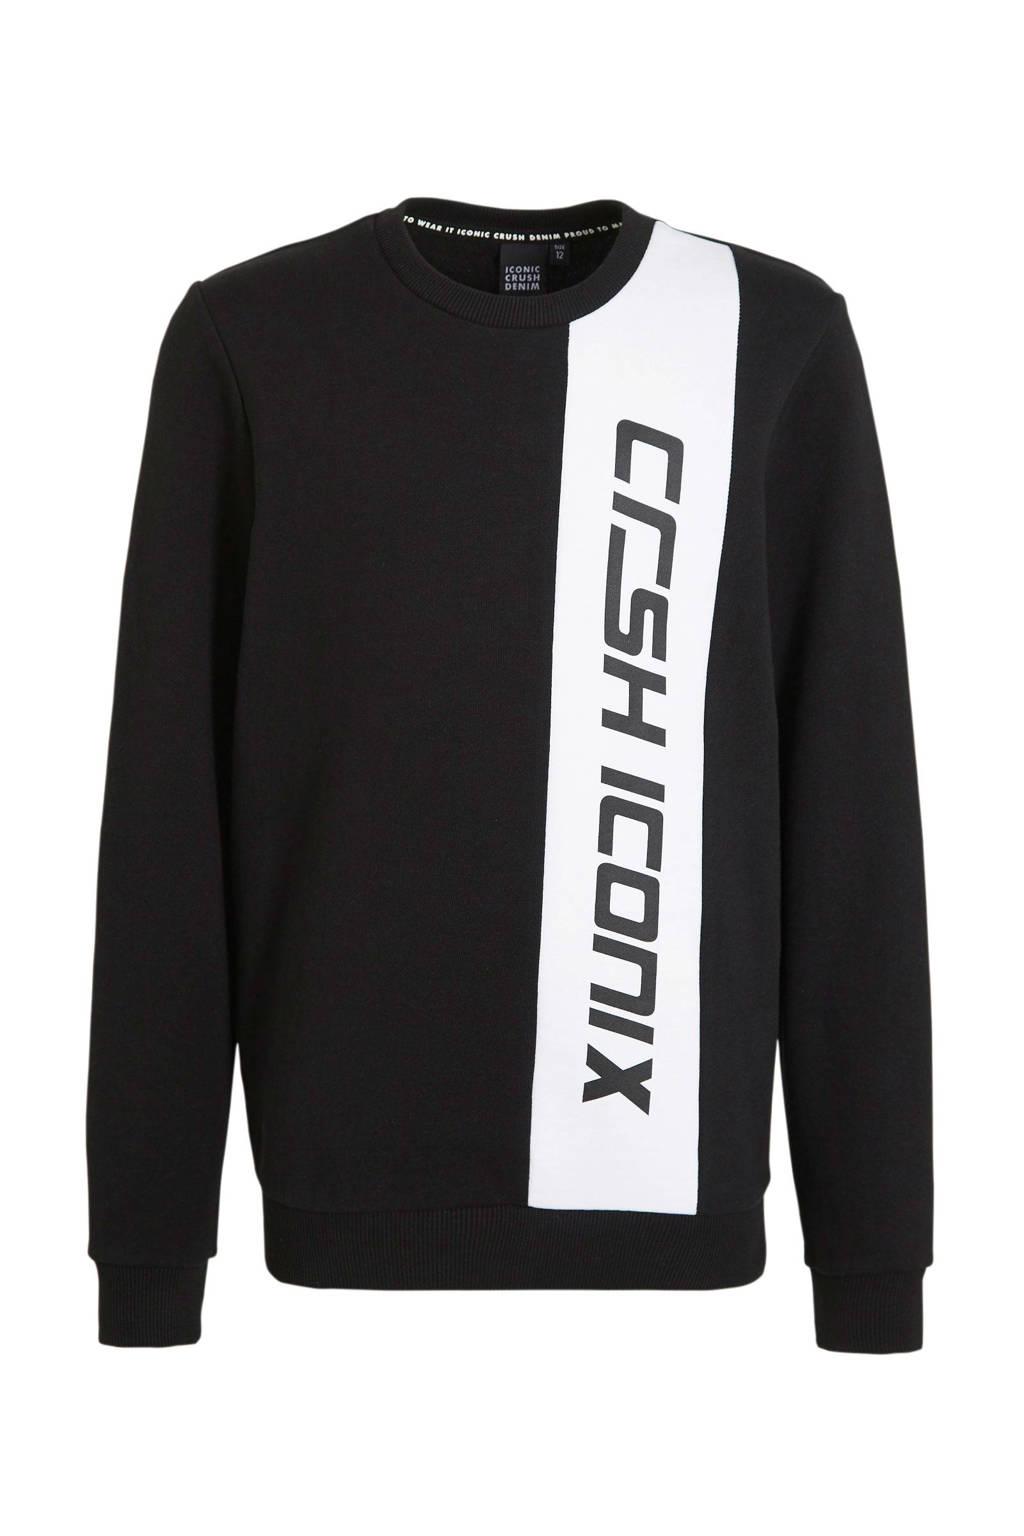 Crush Denim trui Newport met logo zwart, Zwart